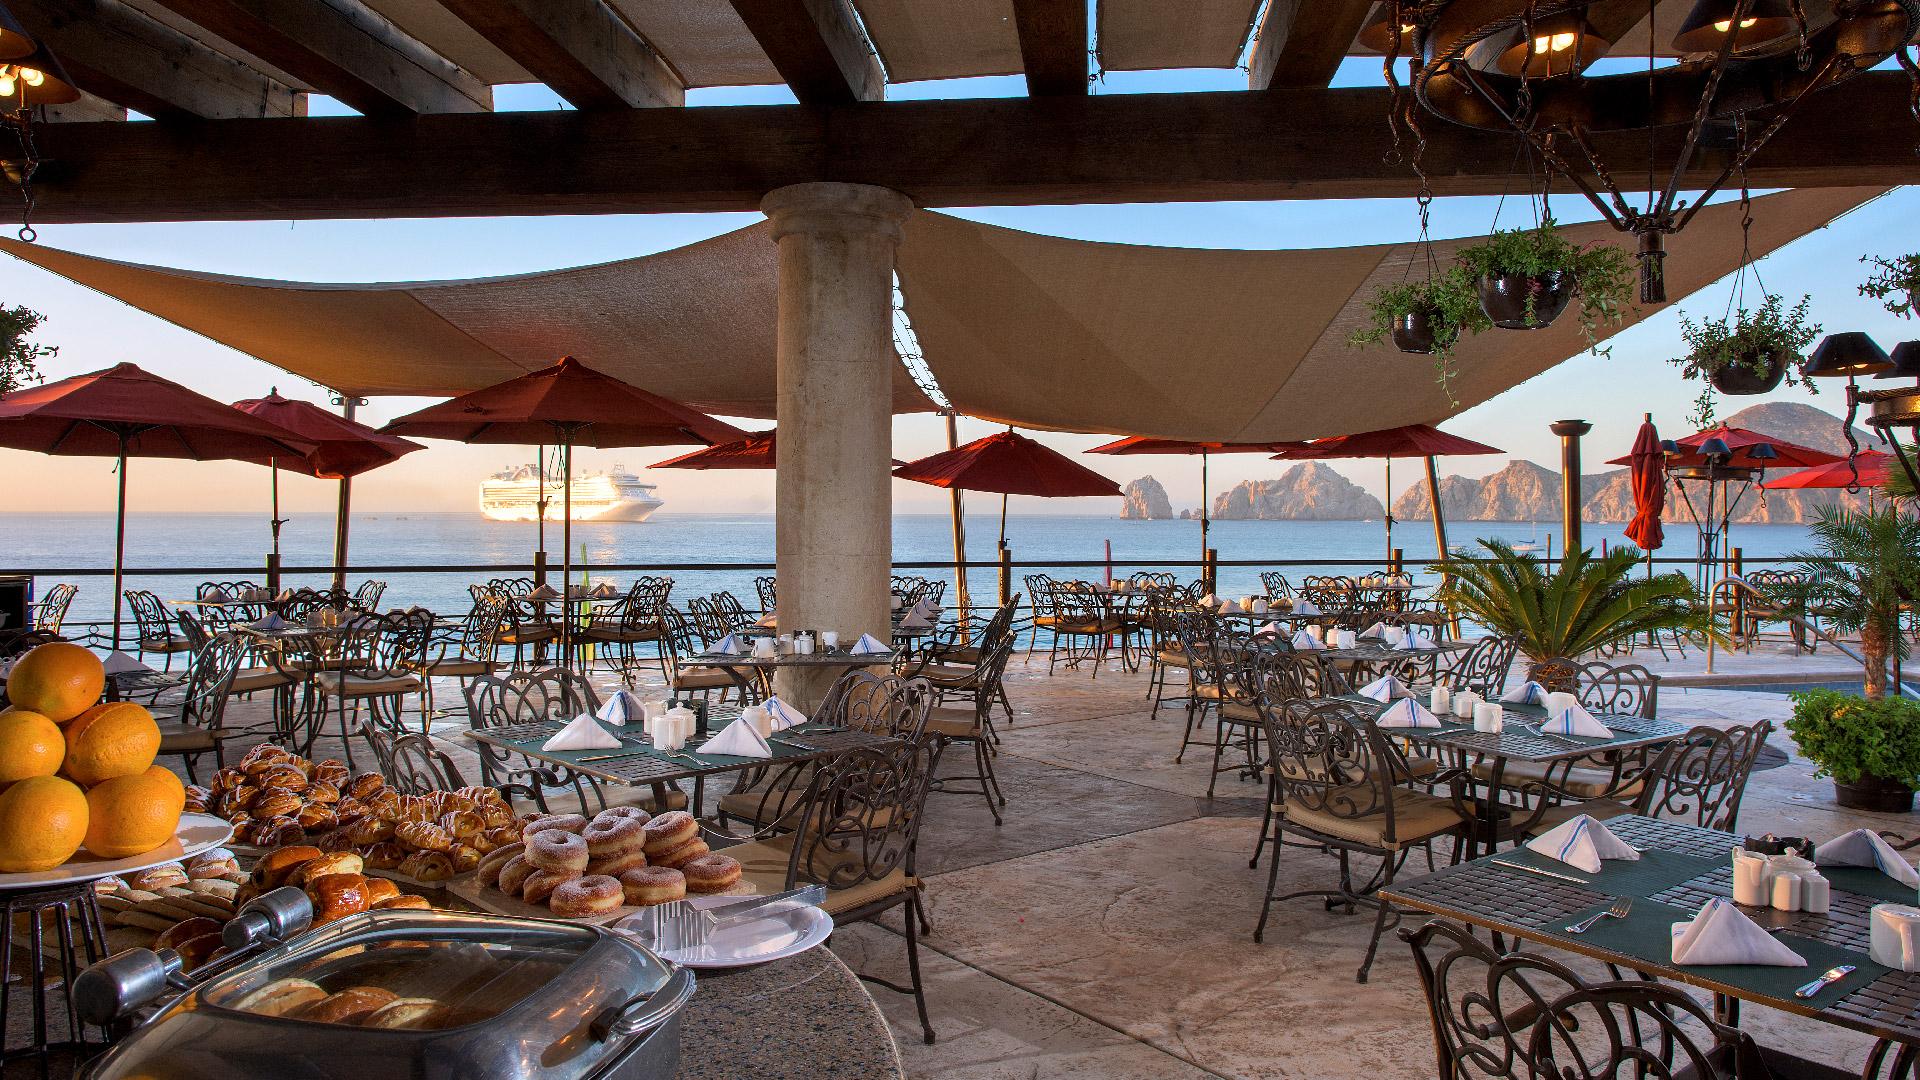 Optimizada villa del palmar cabo san lucas bella california restaurant 4  1